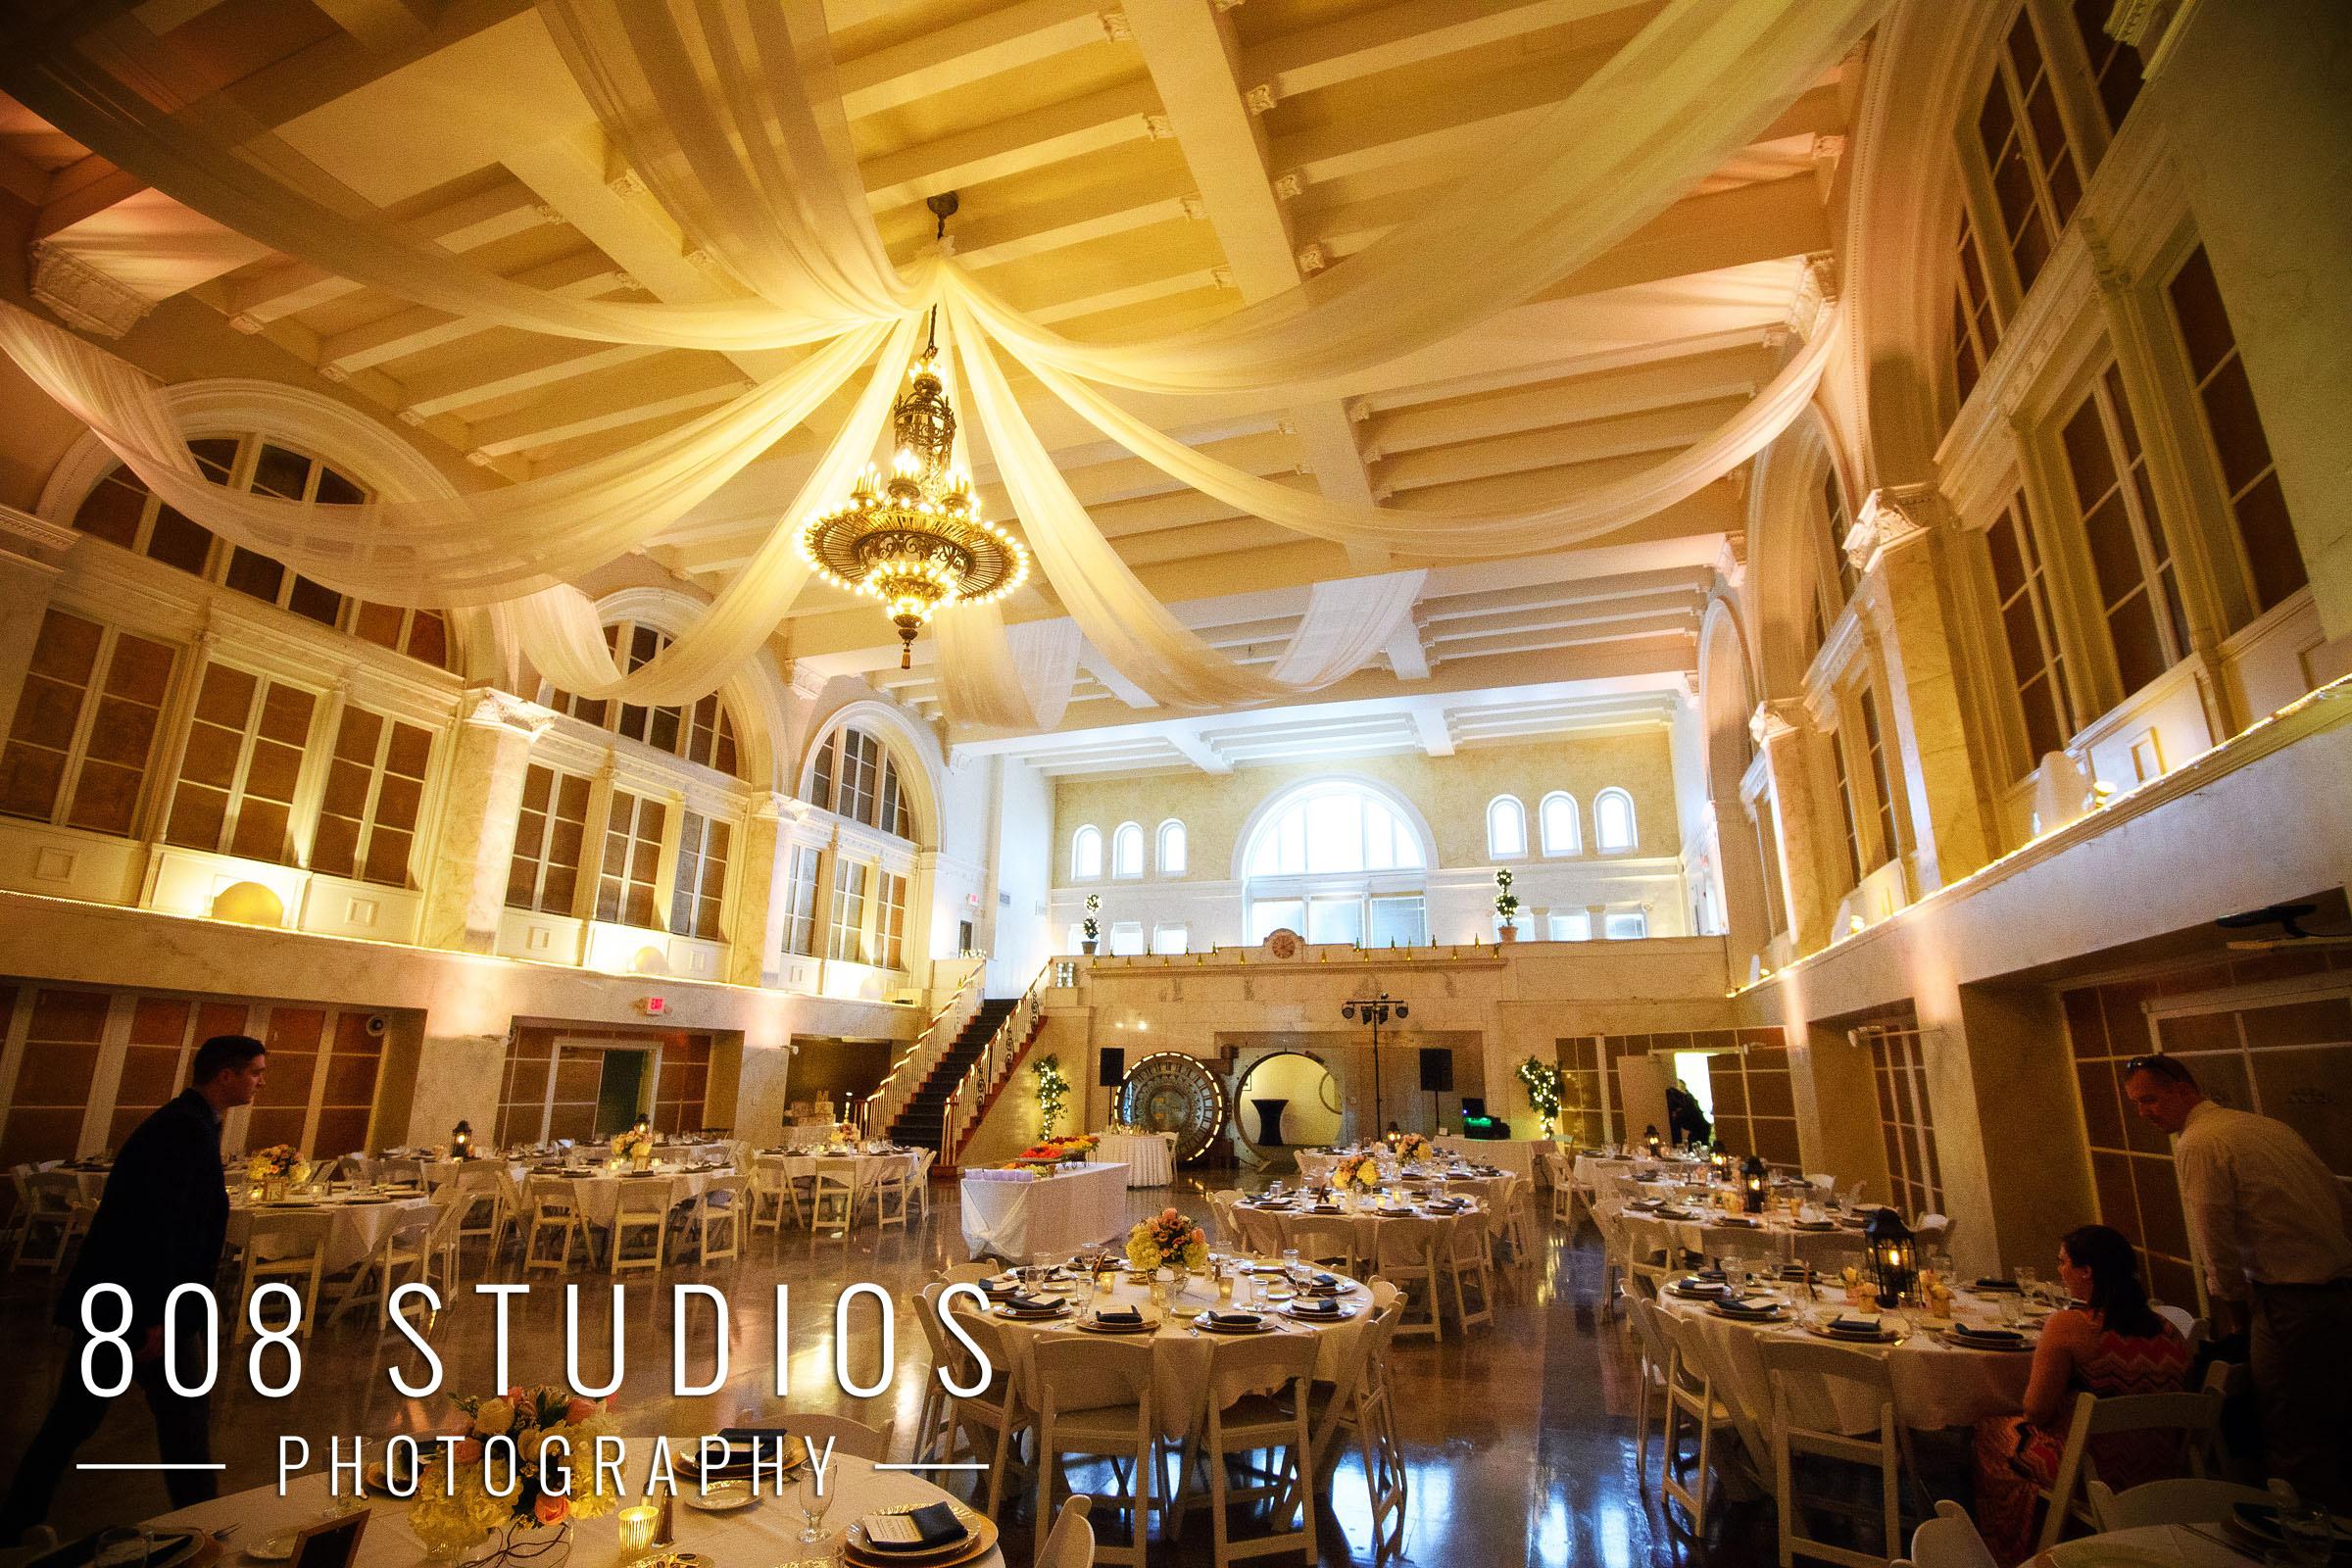 808 Studios Photography